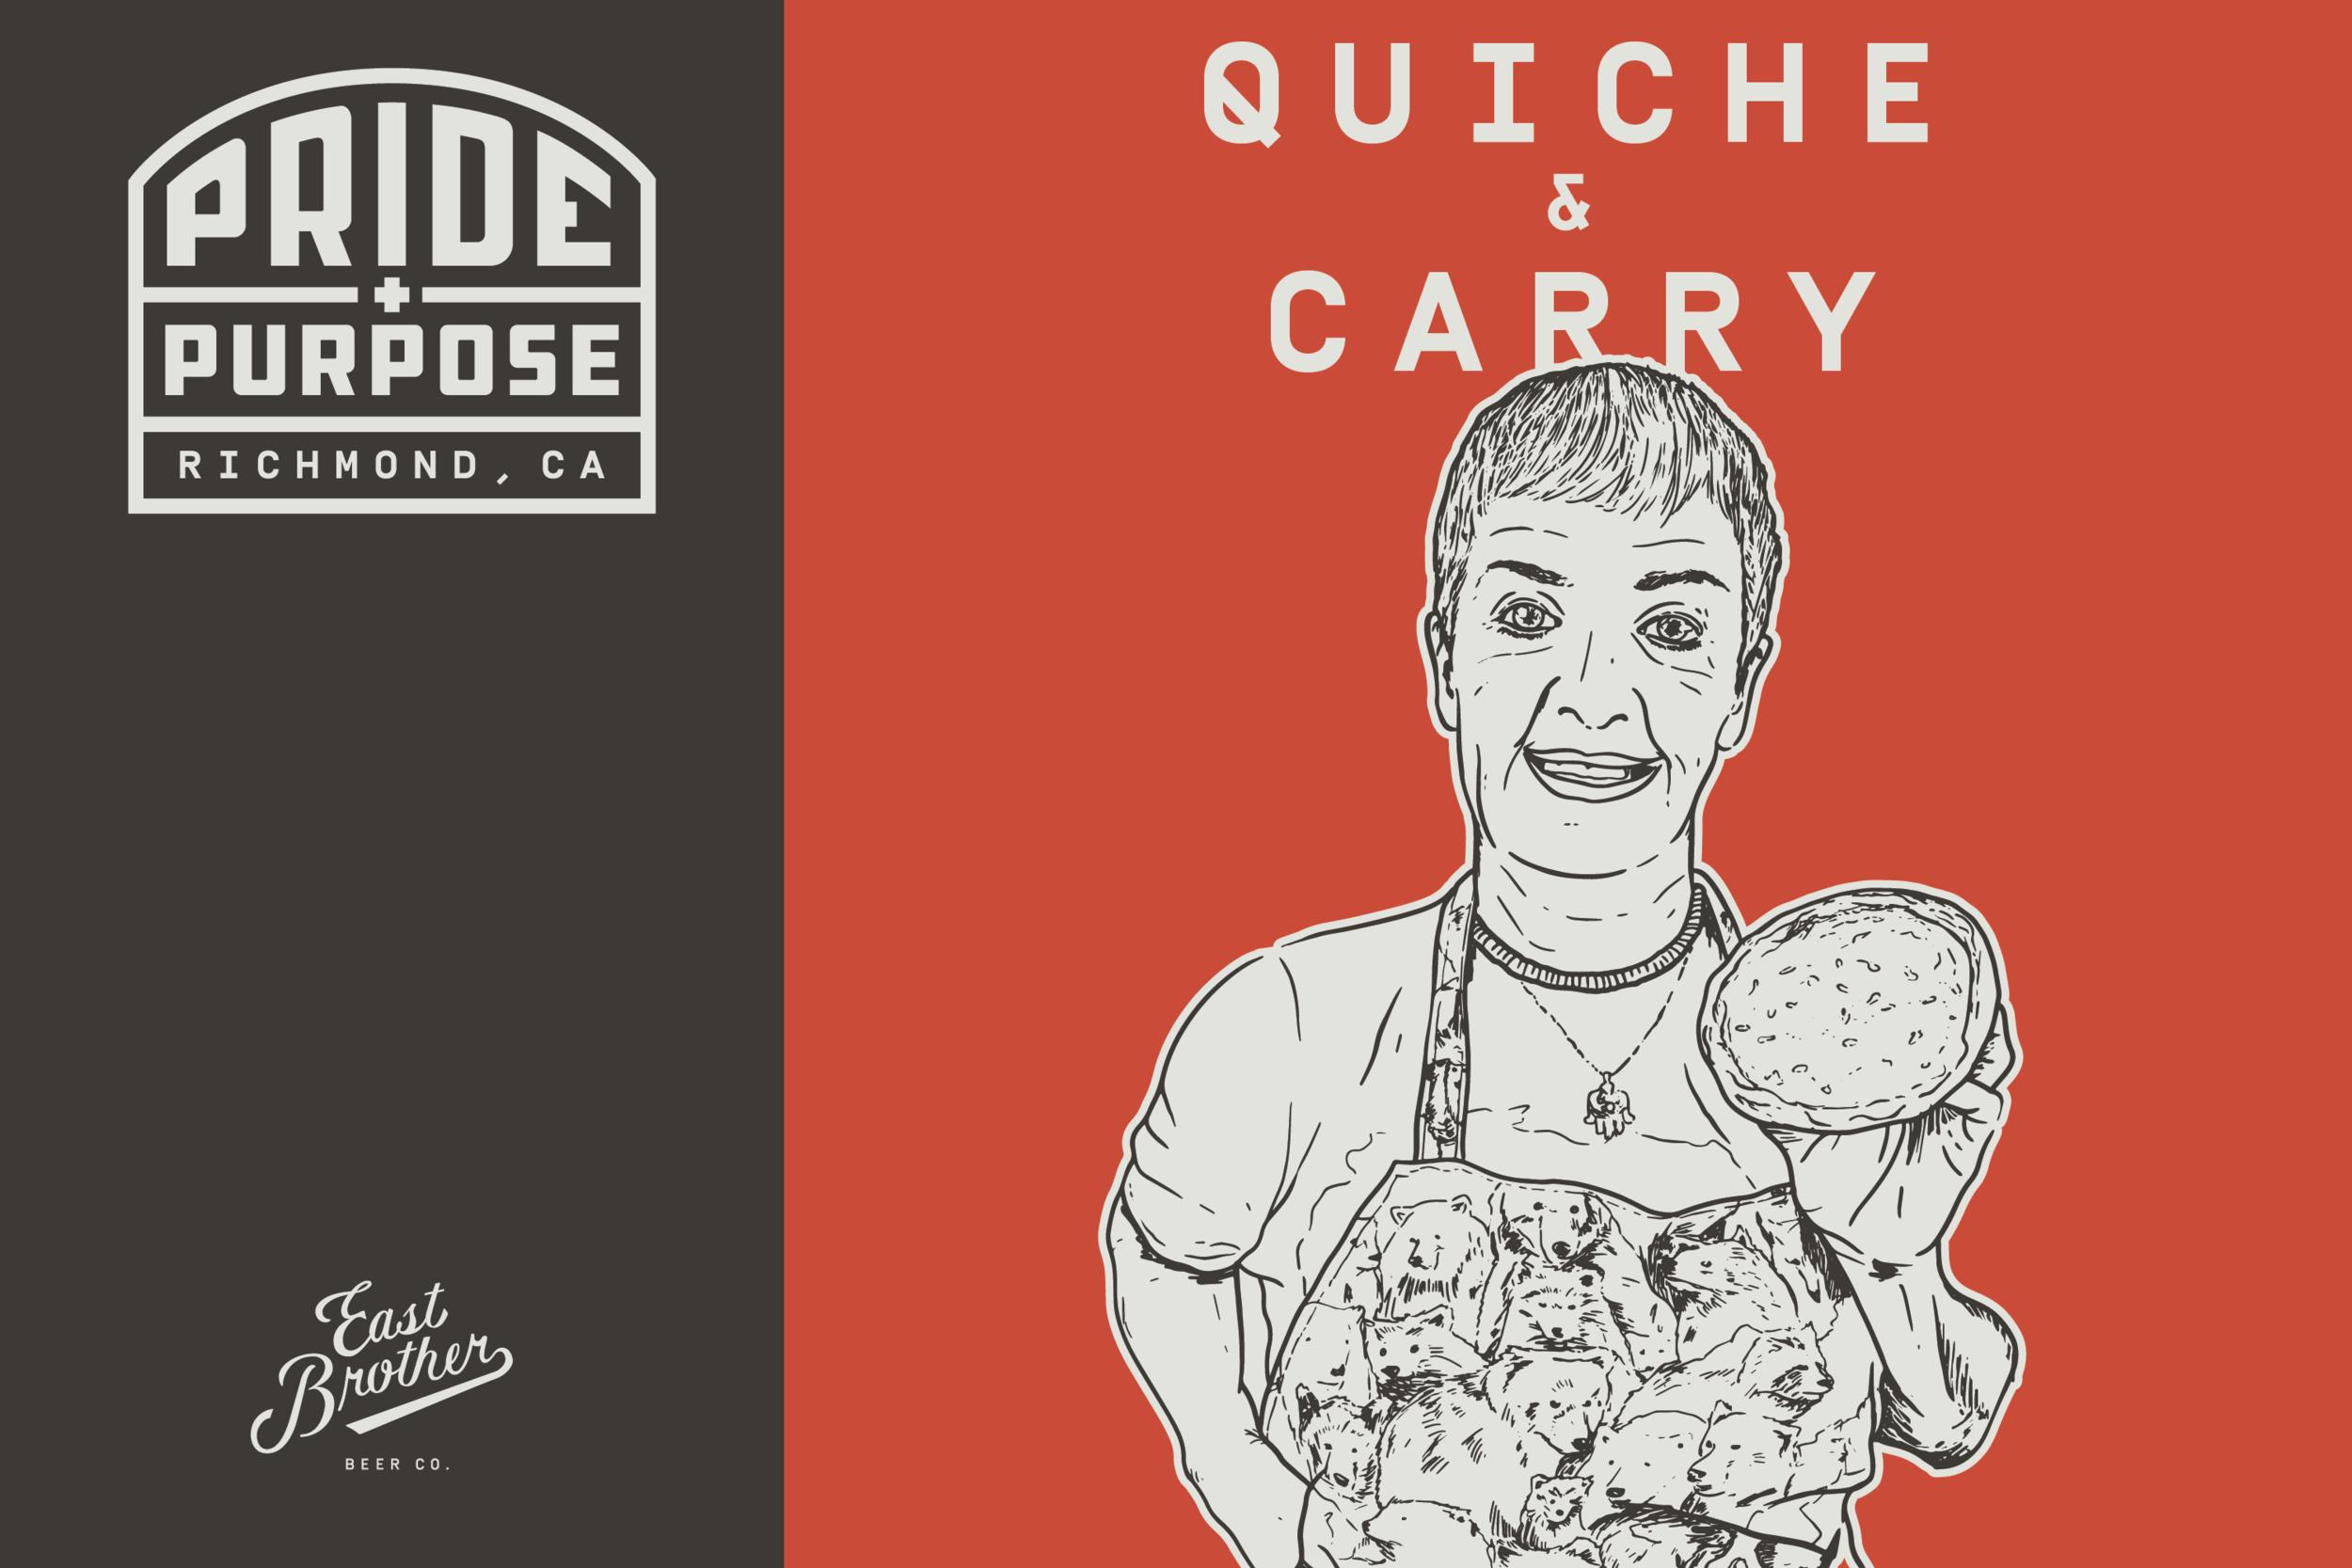 prideandpurpose.quicheandcarry.cover.png